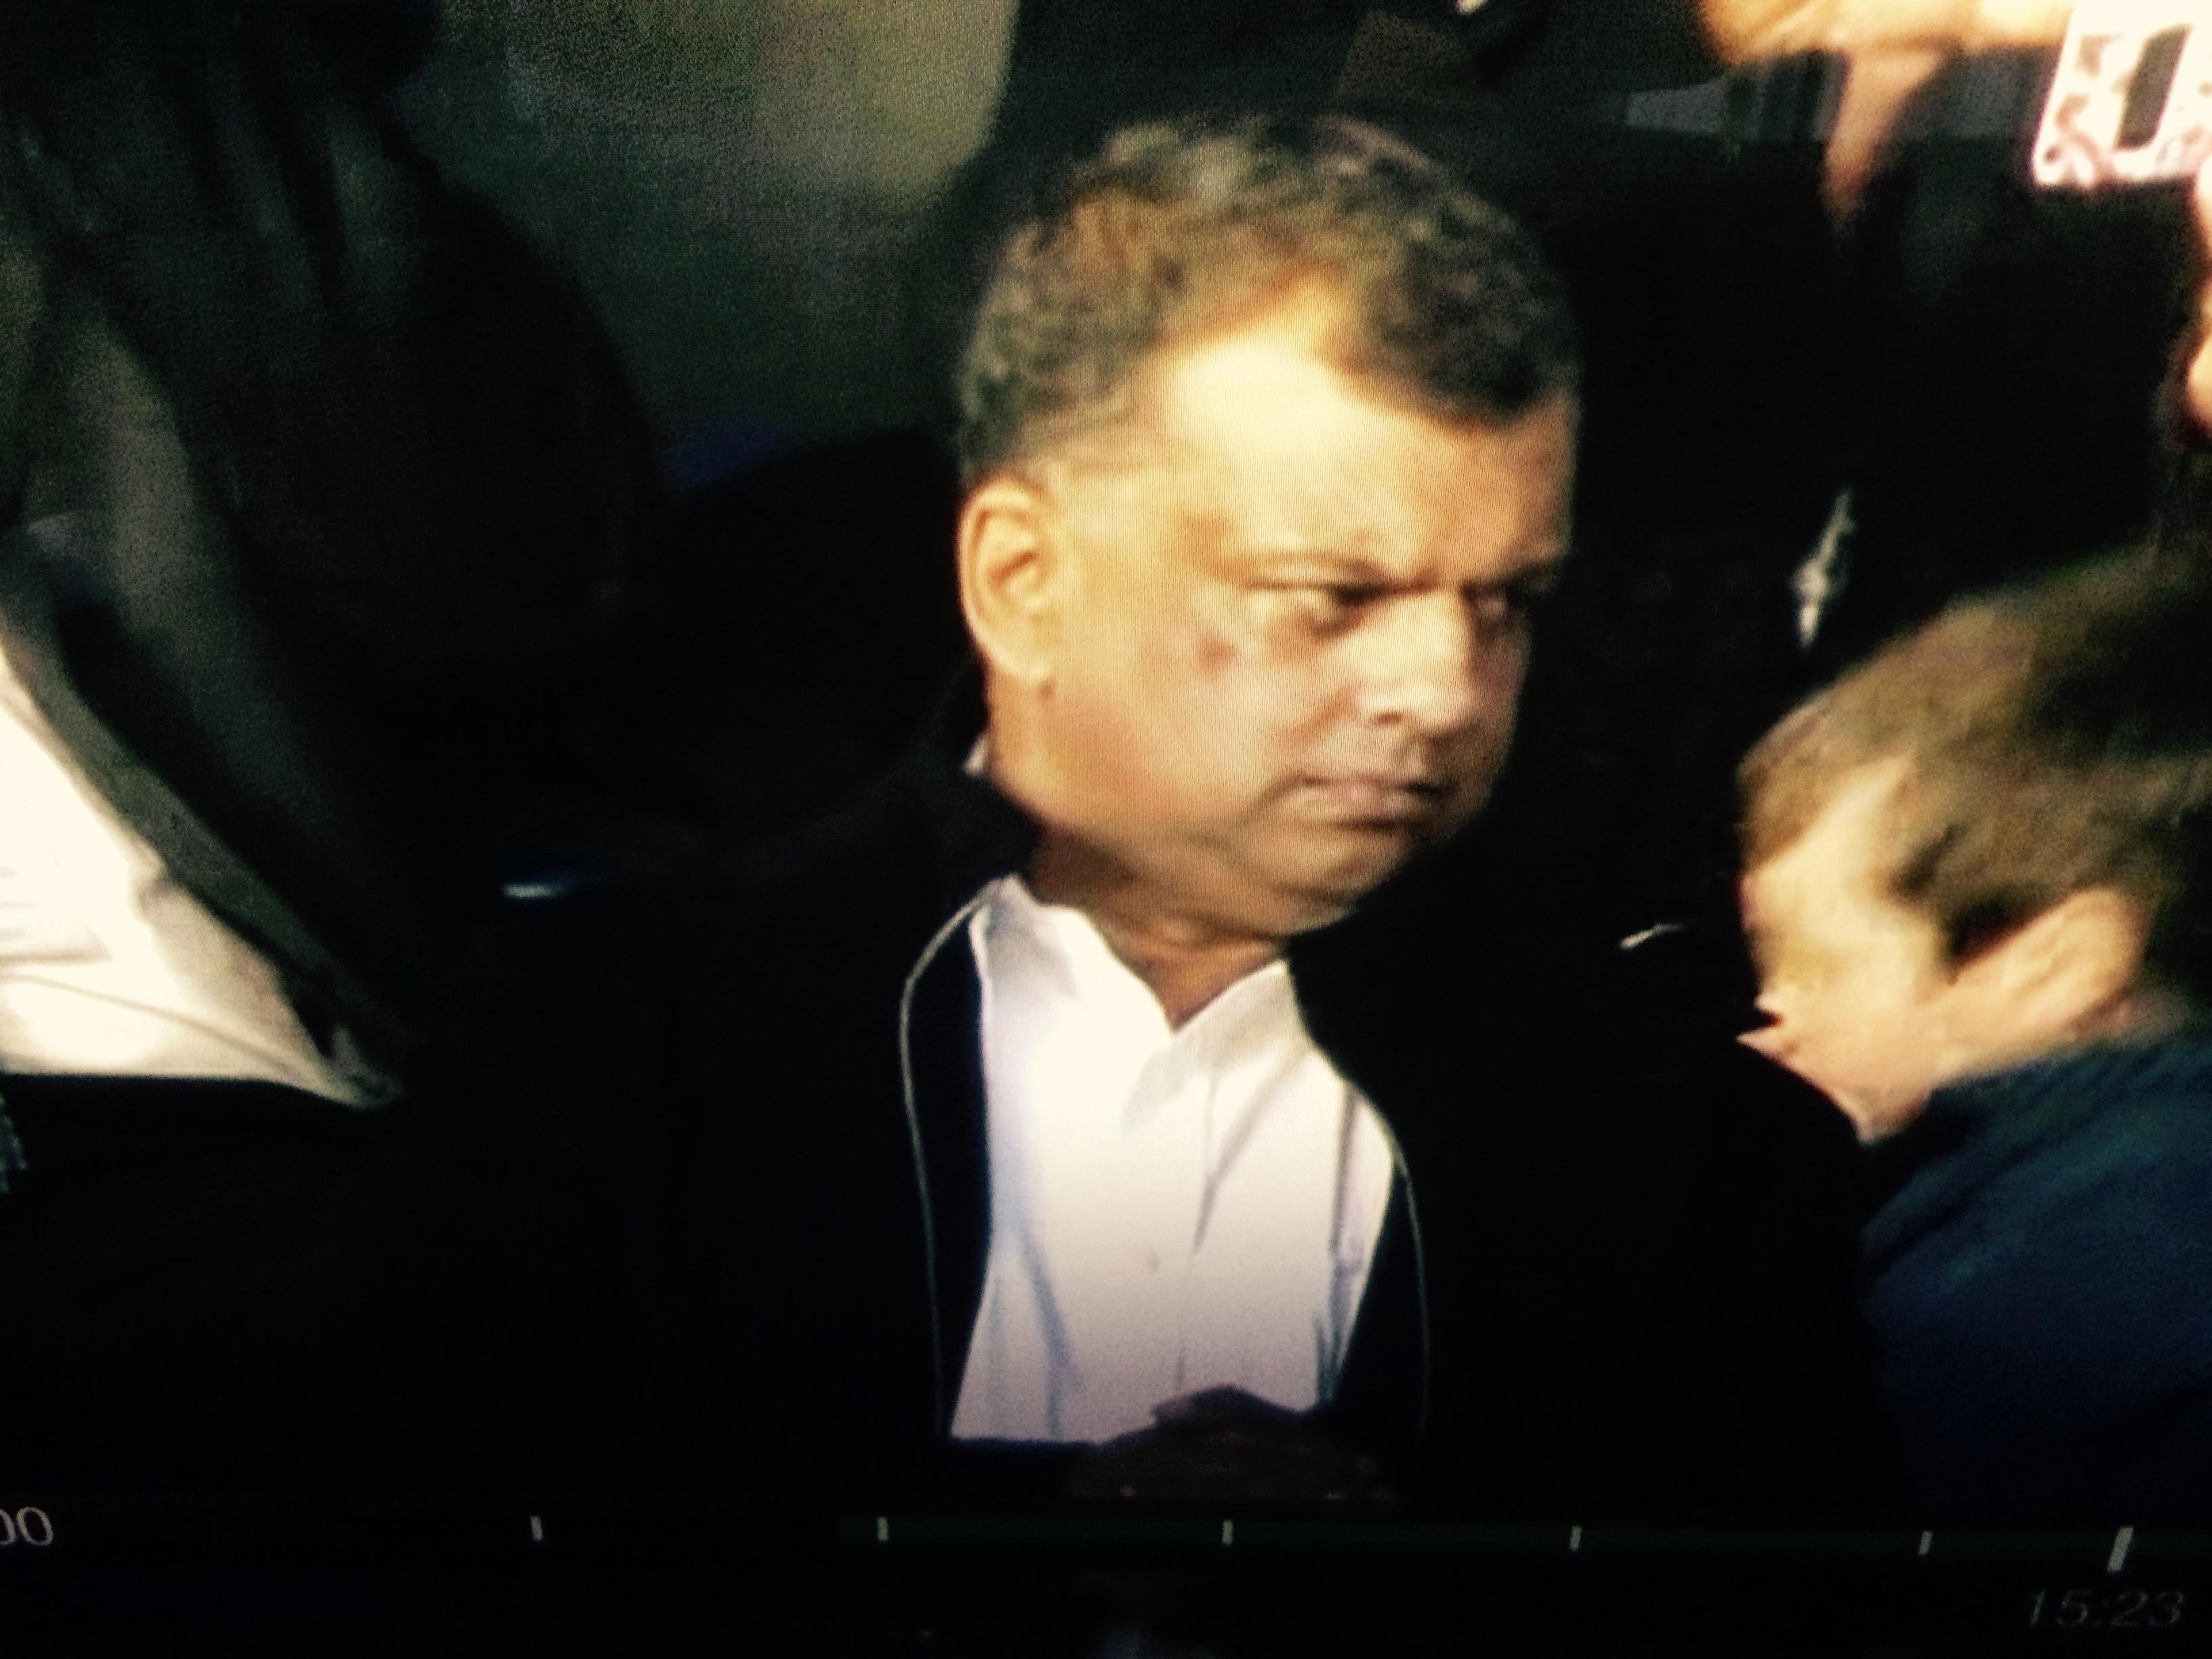 94th minute - QPR 2 - 3 Liverpool